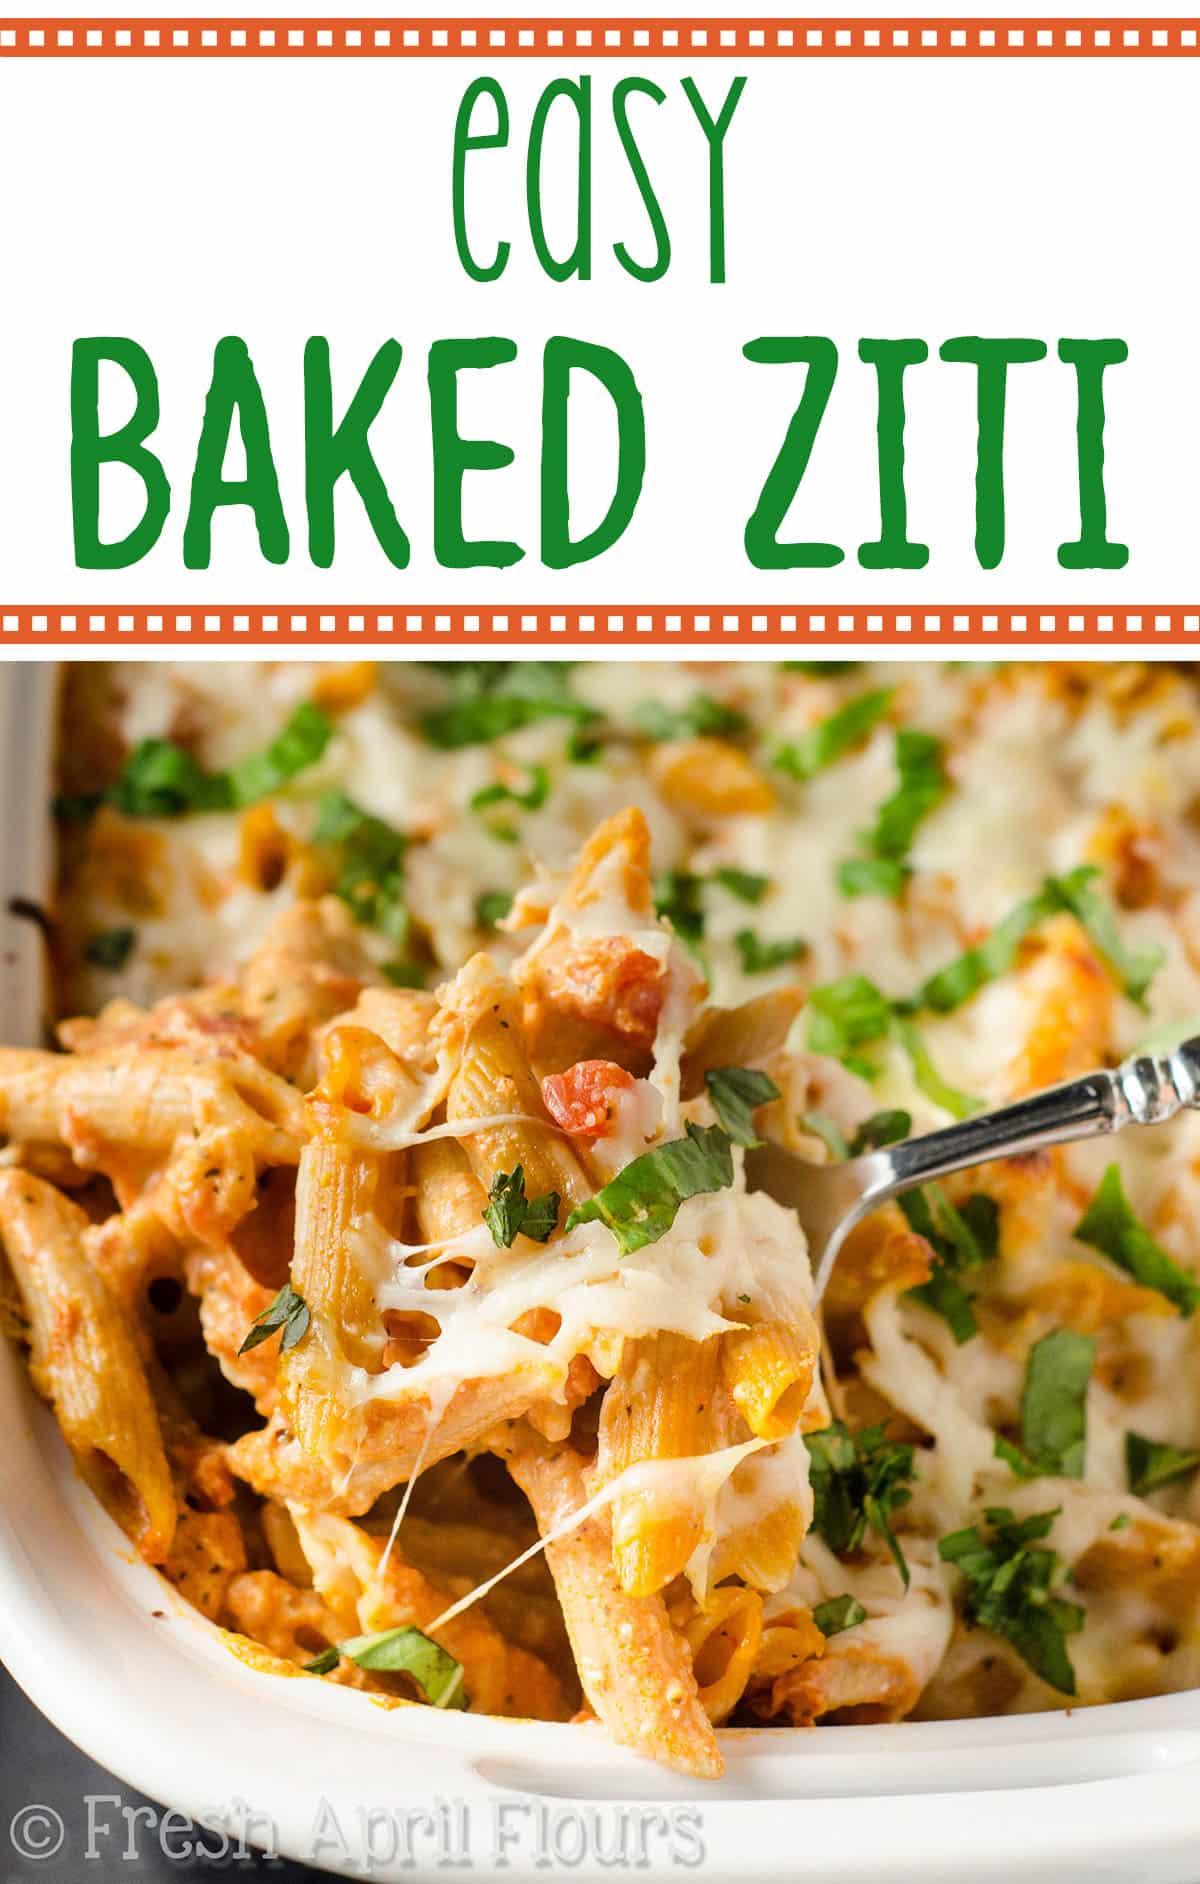 My Favorite Baked Ziti